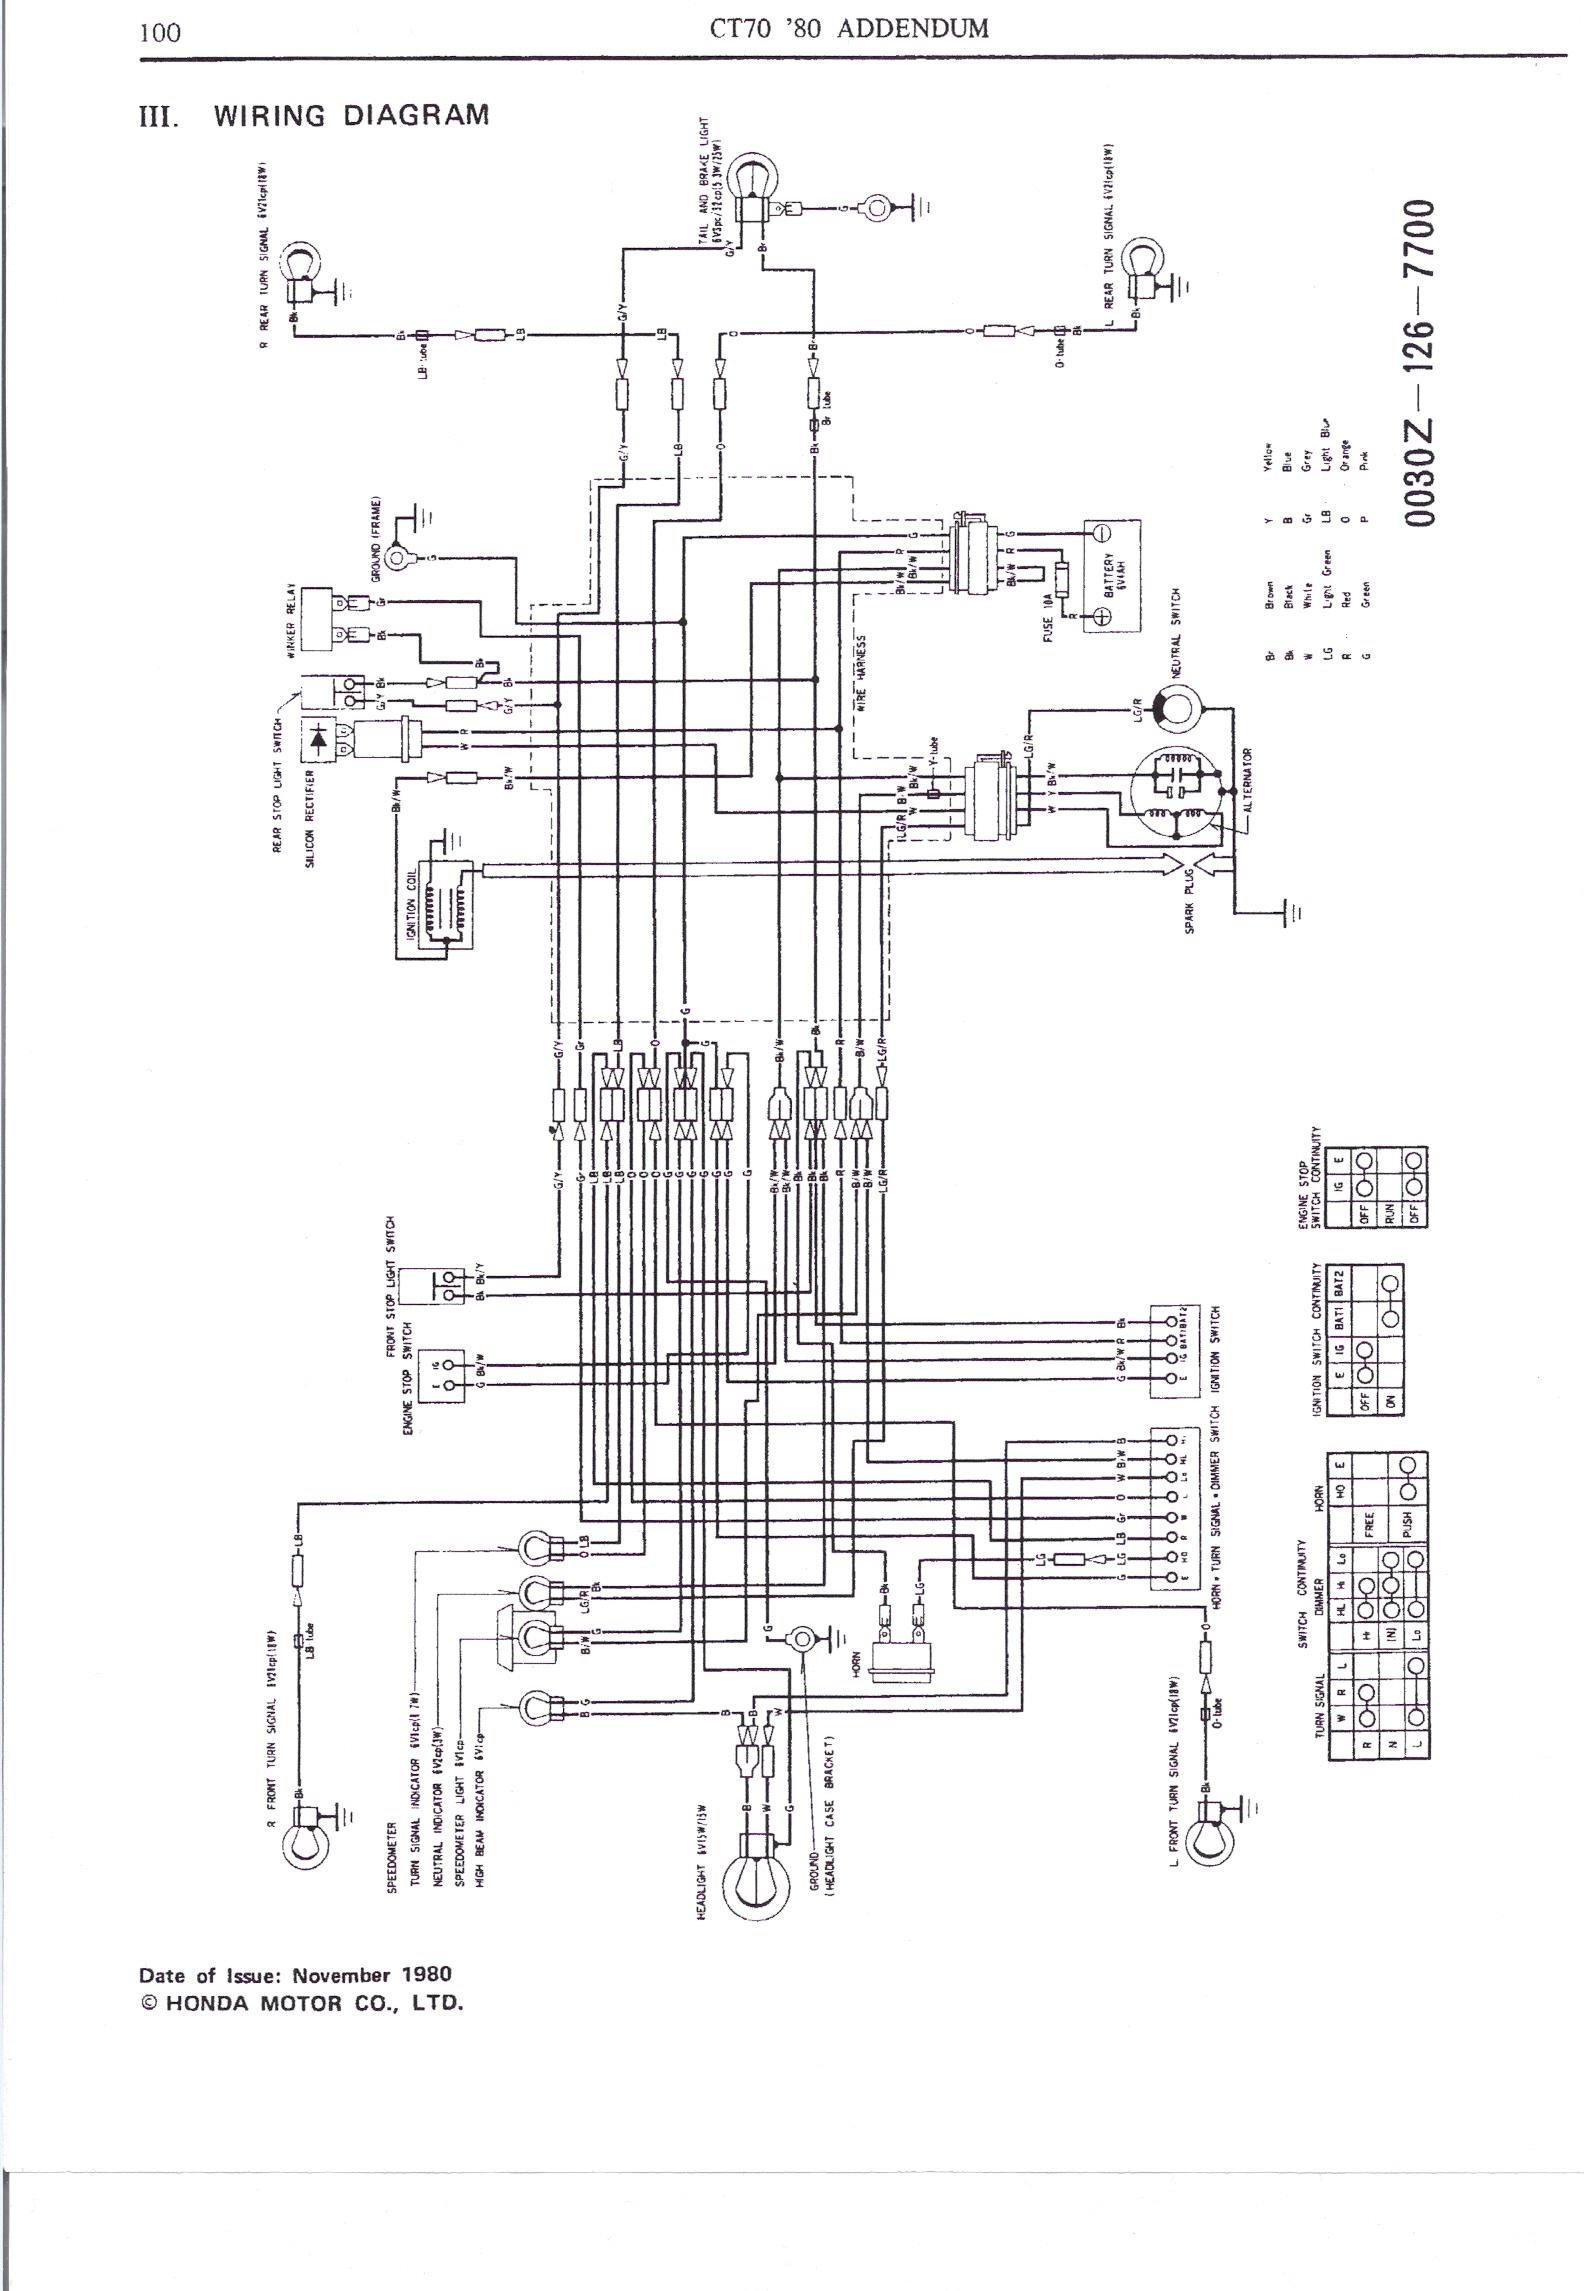 1971 honda ct 70 wiring diagram 1970 honda ct70 wiring